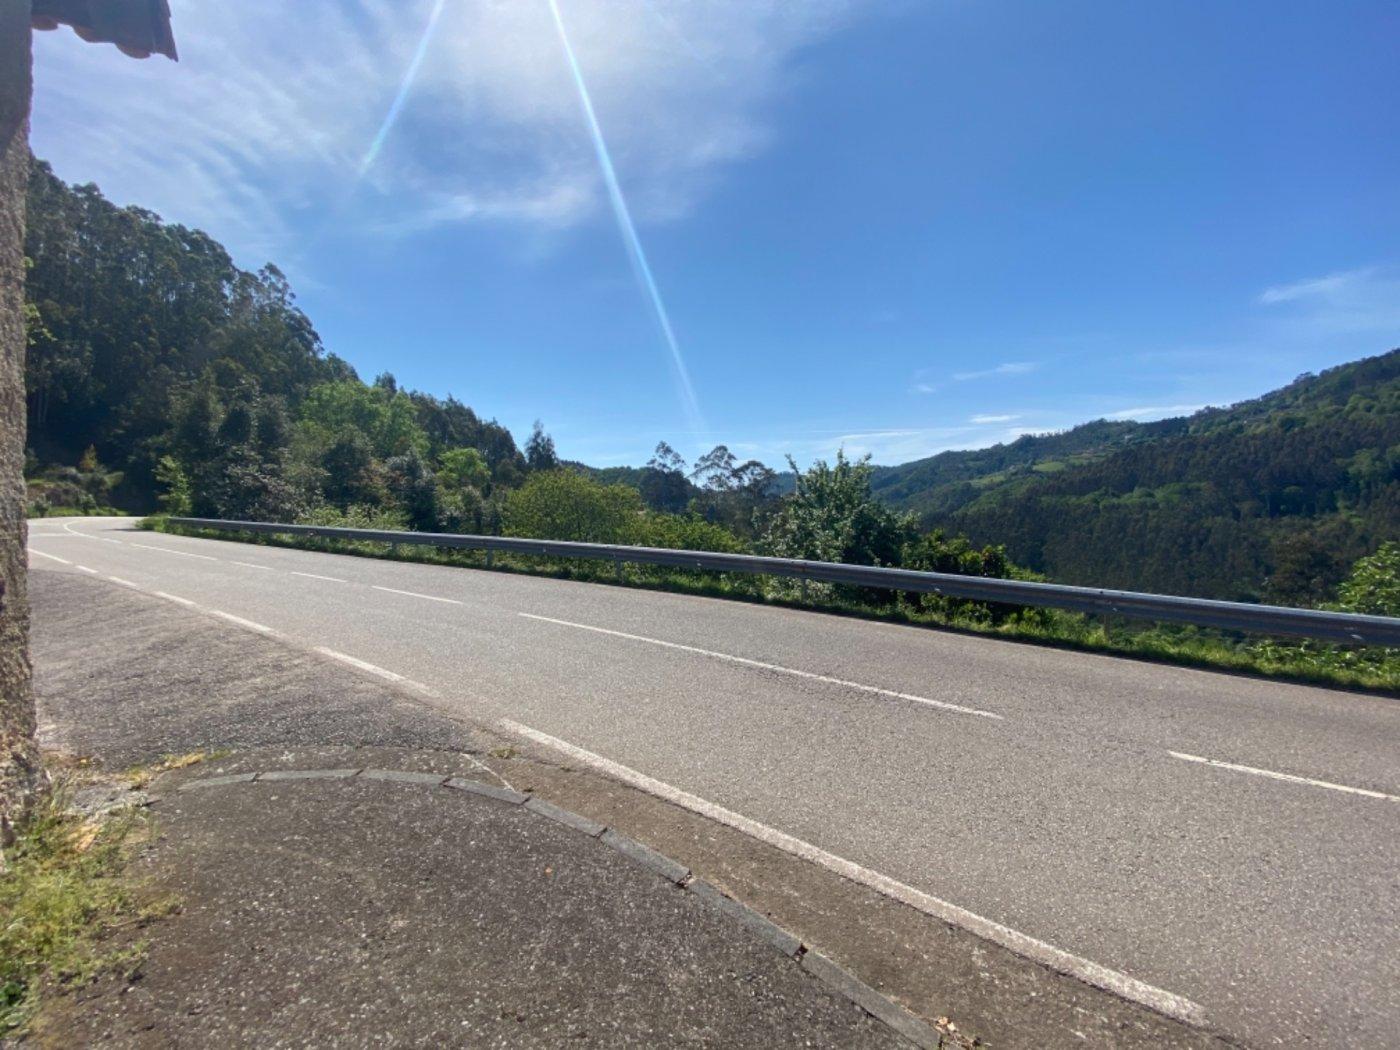 Cuadra para rehabilitar a 5 kilómetros de villaviciosa - imagenInmueble7